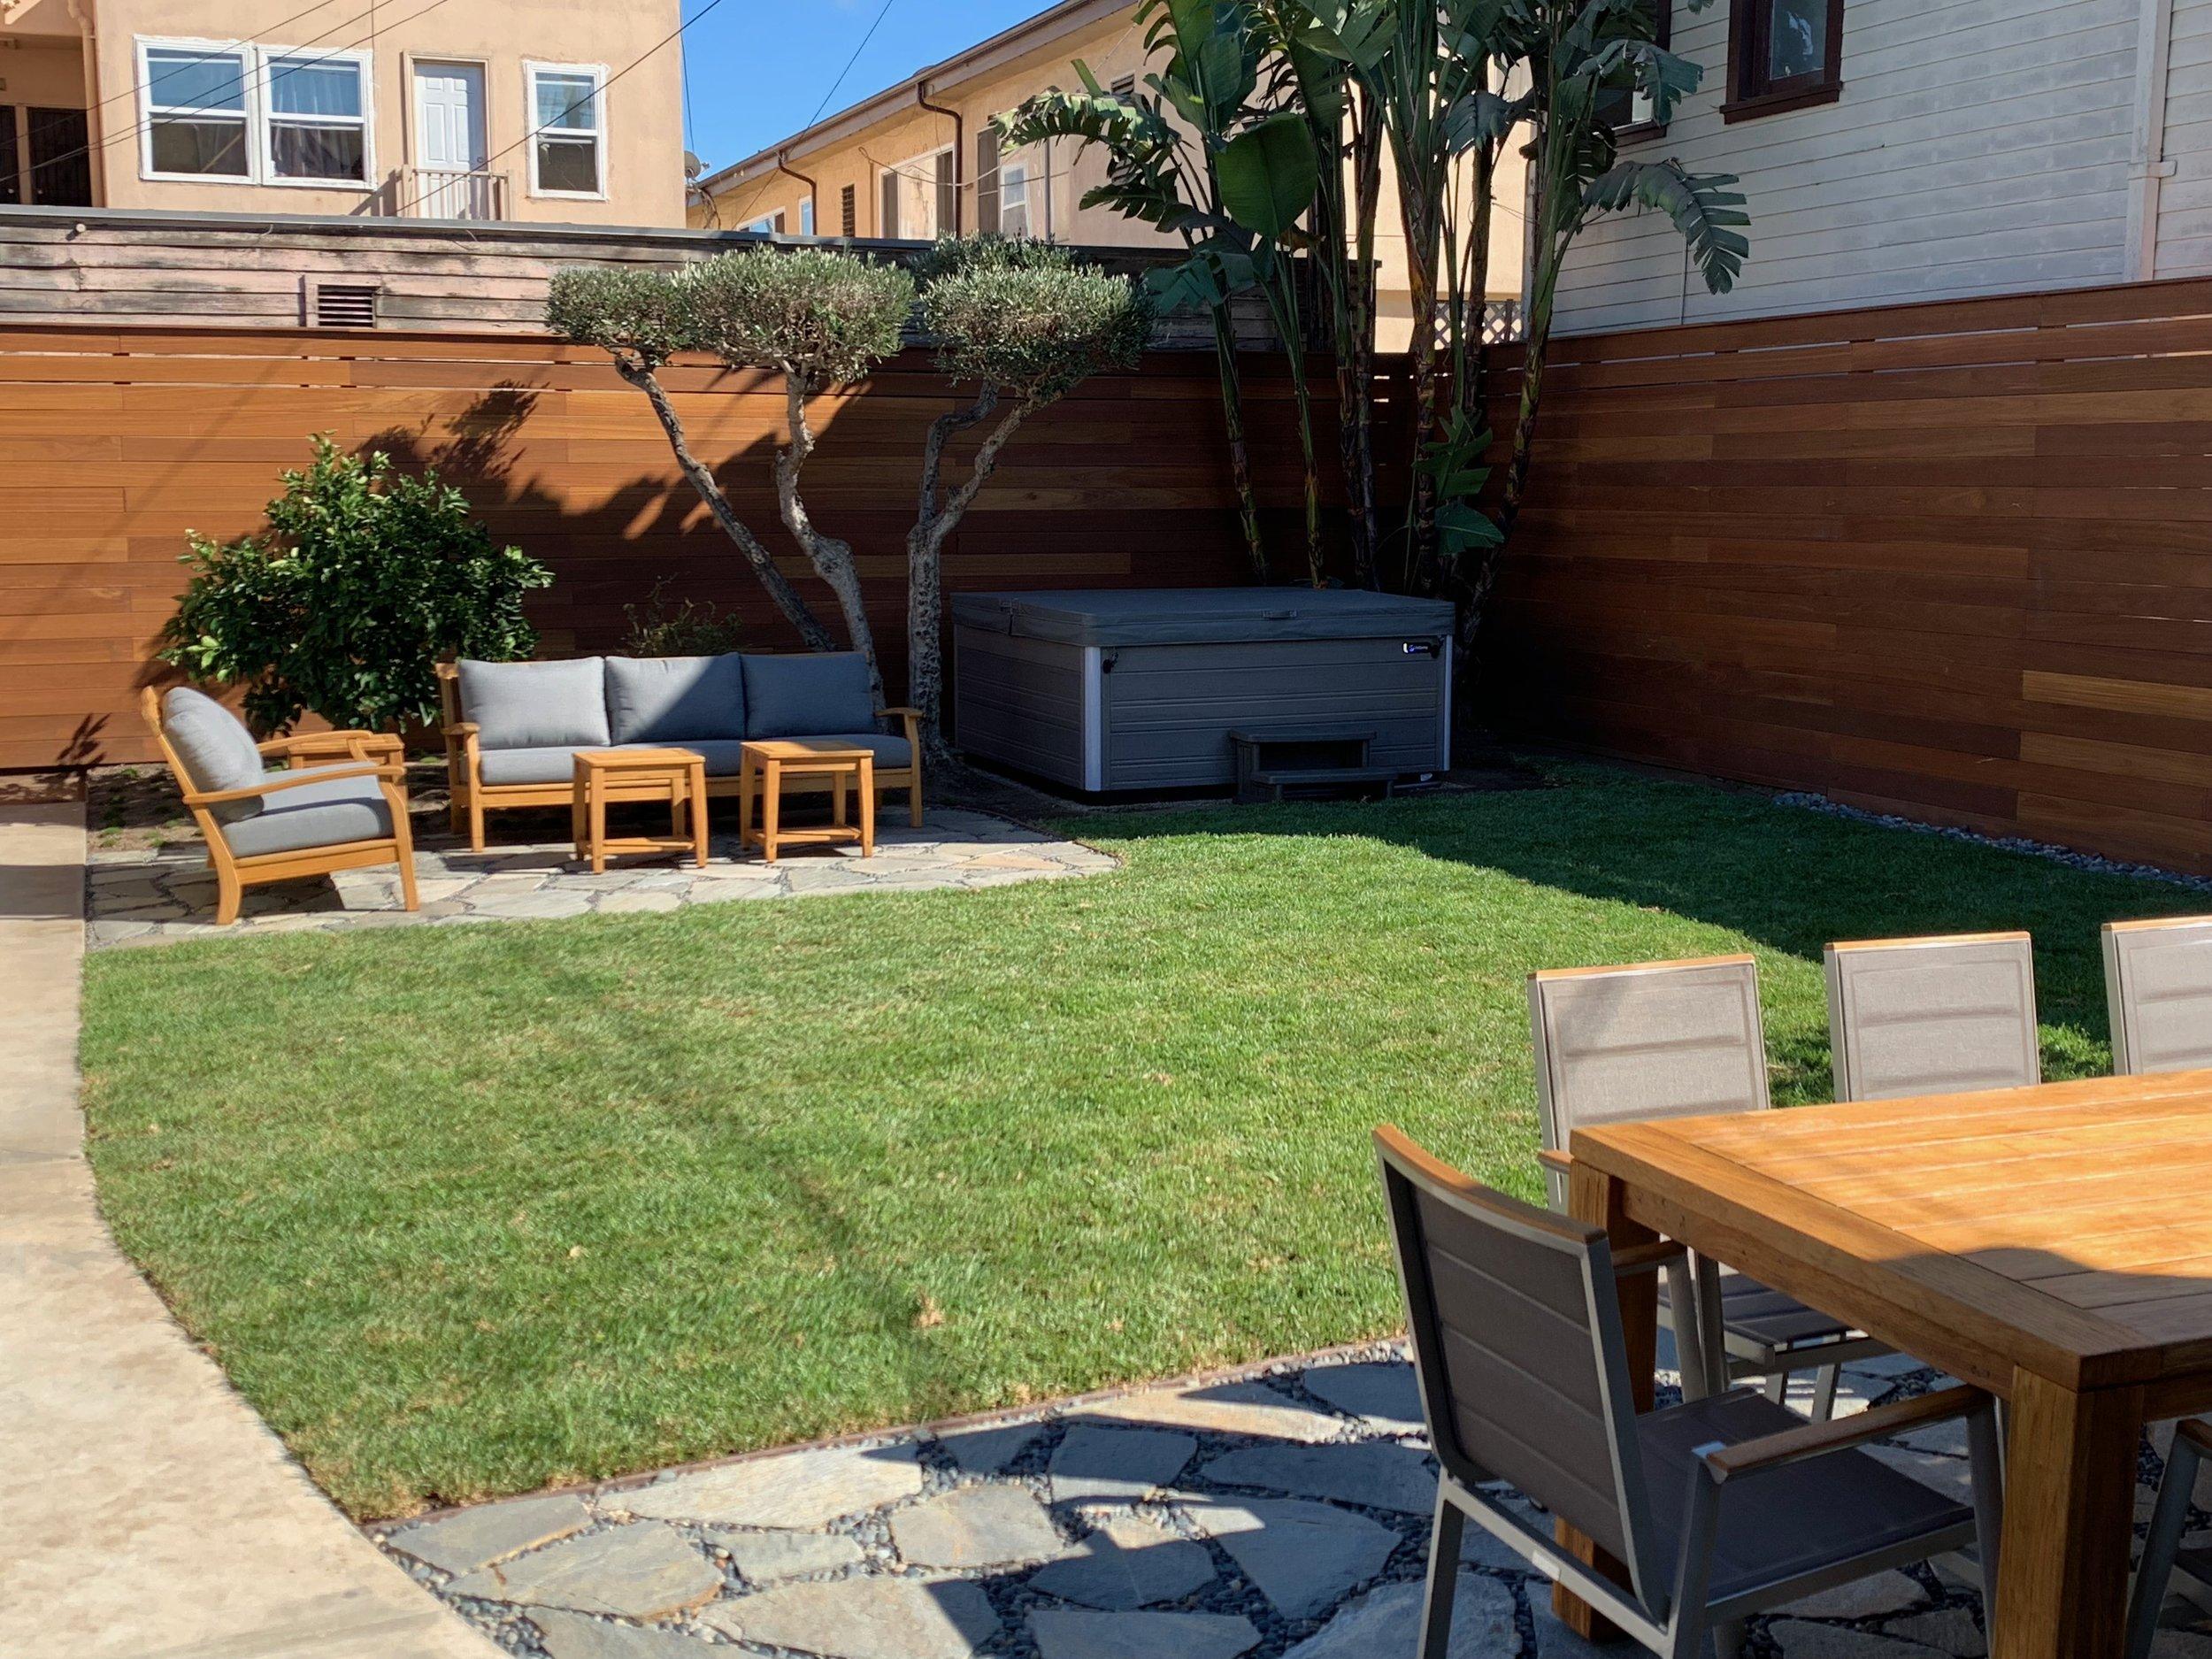 Redwood Horizontal Fence - Los Angeles Fence Builders.jpeg